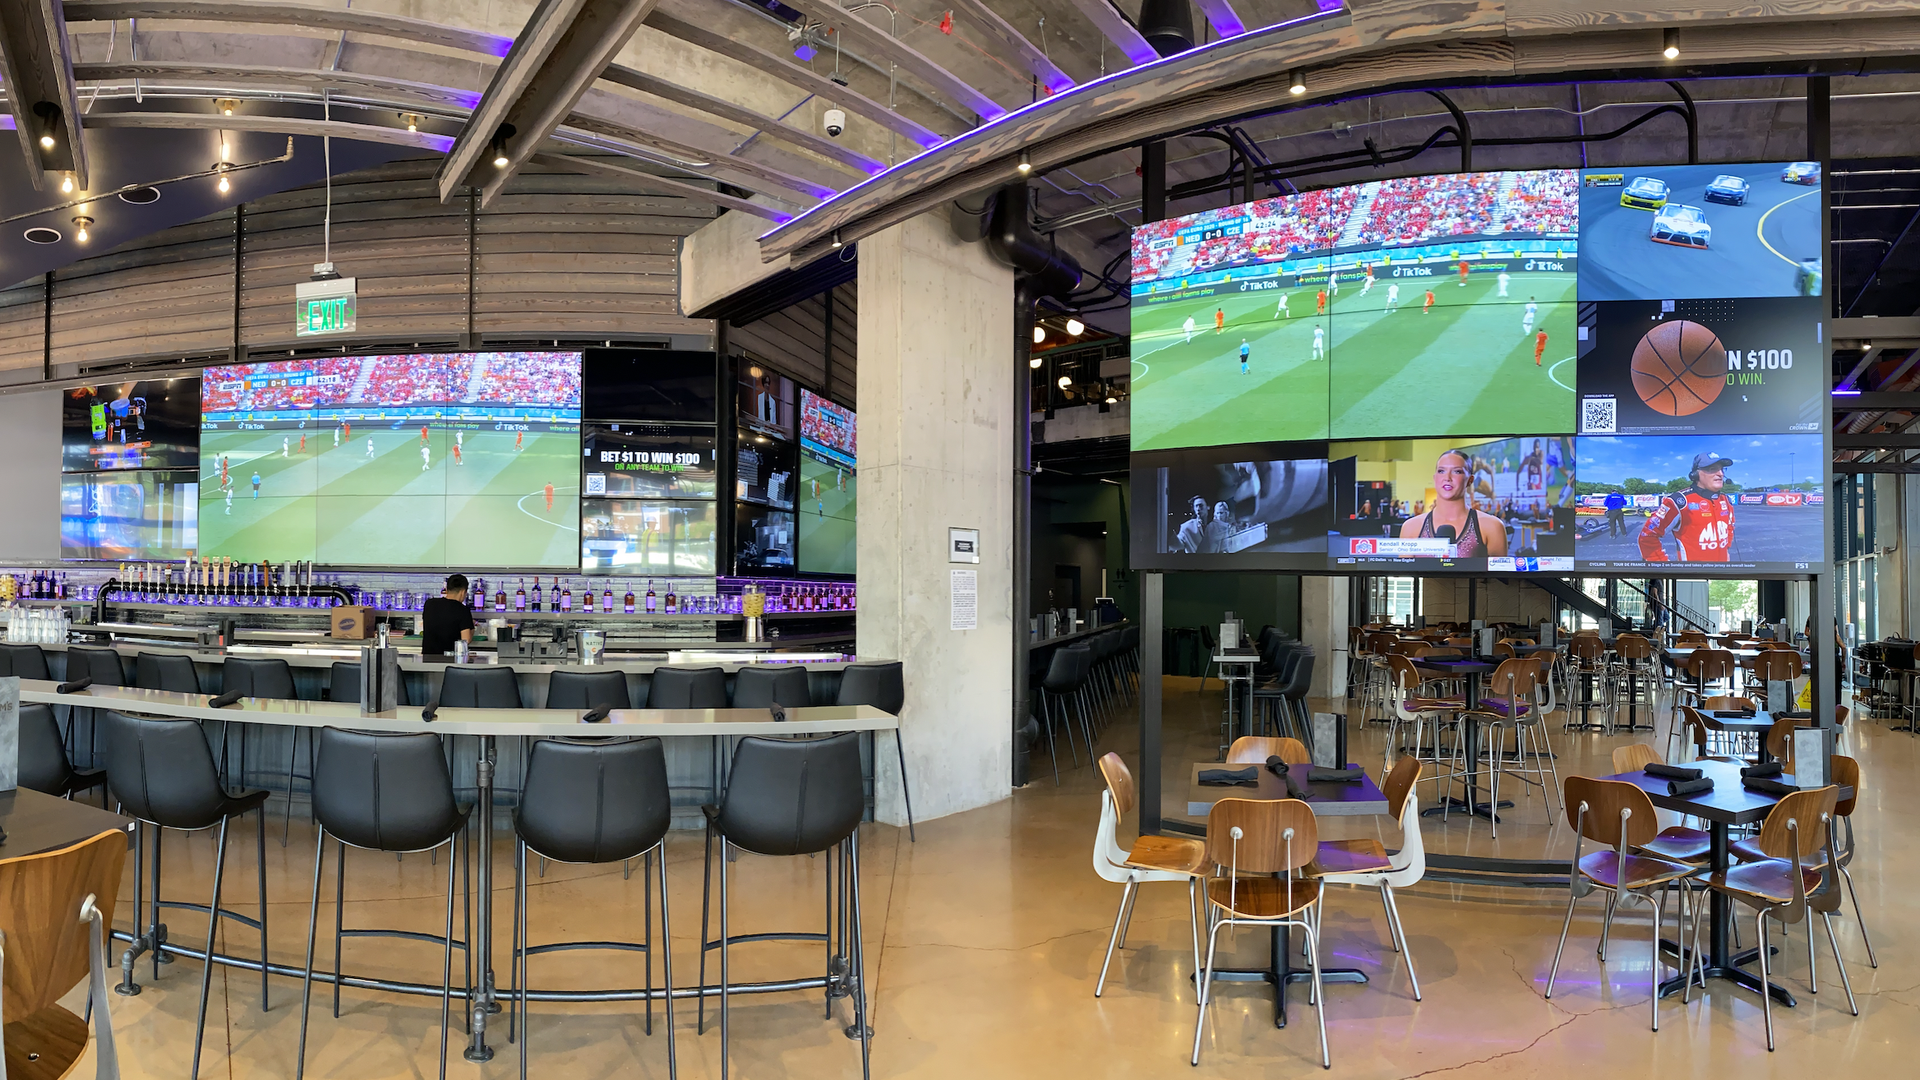 Inside a bar with big-screen TVs